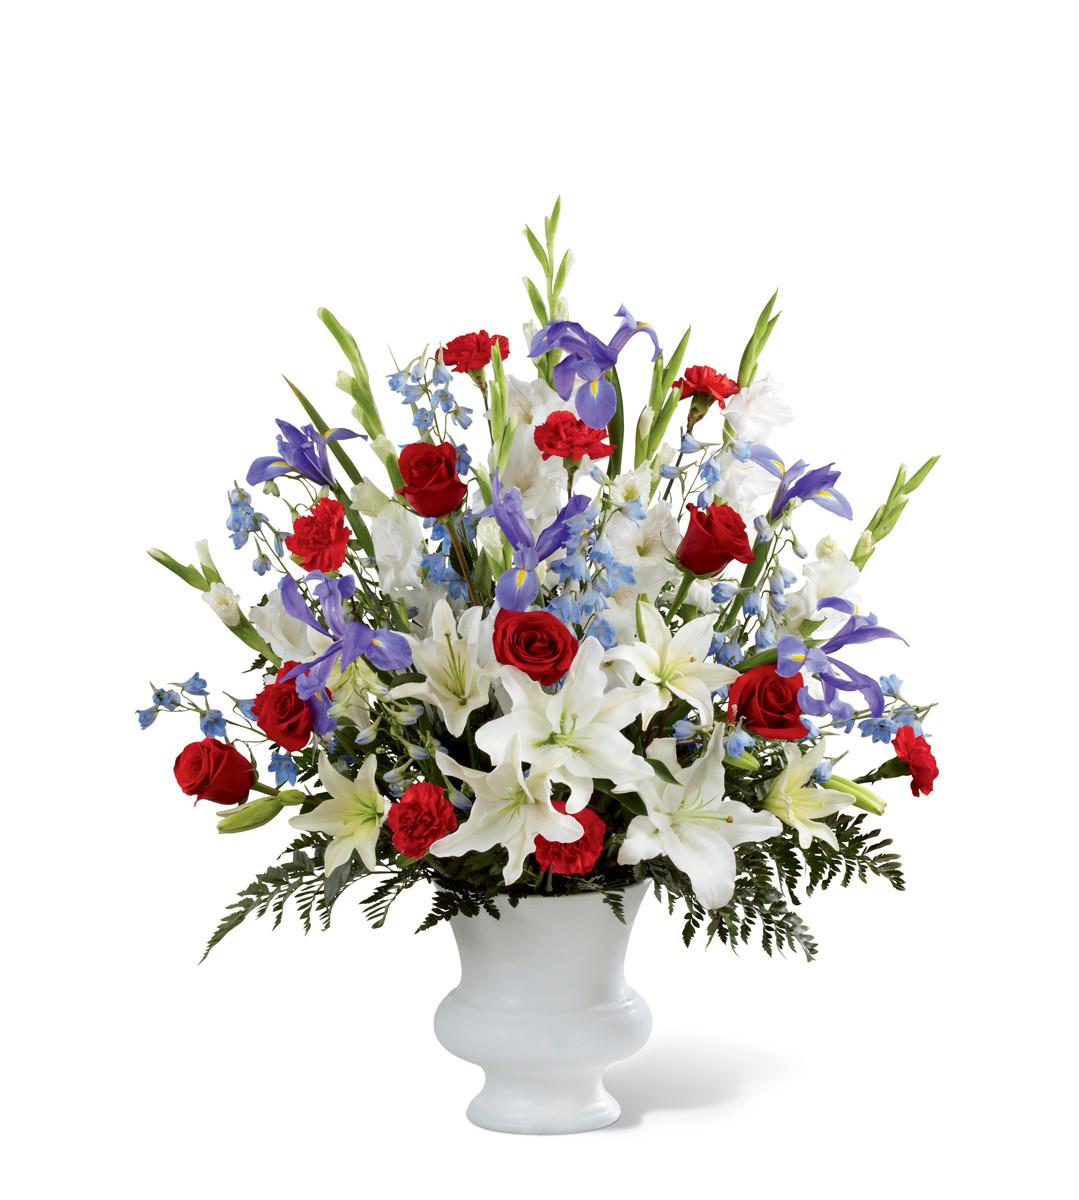 The FTD Cherished Farewell™ Arrangement Urbandale IA Florist